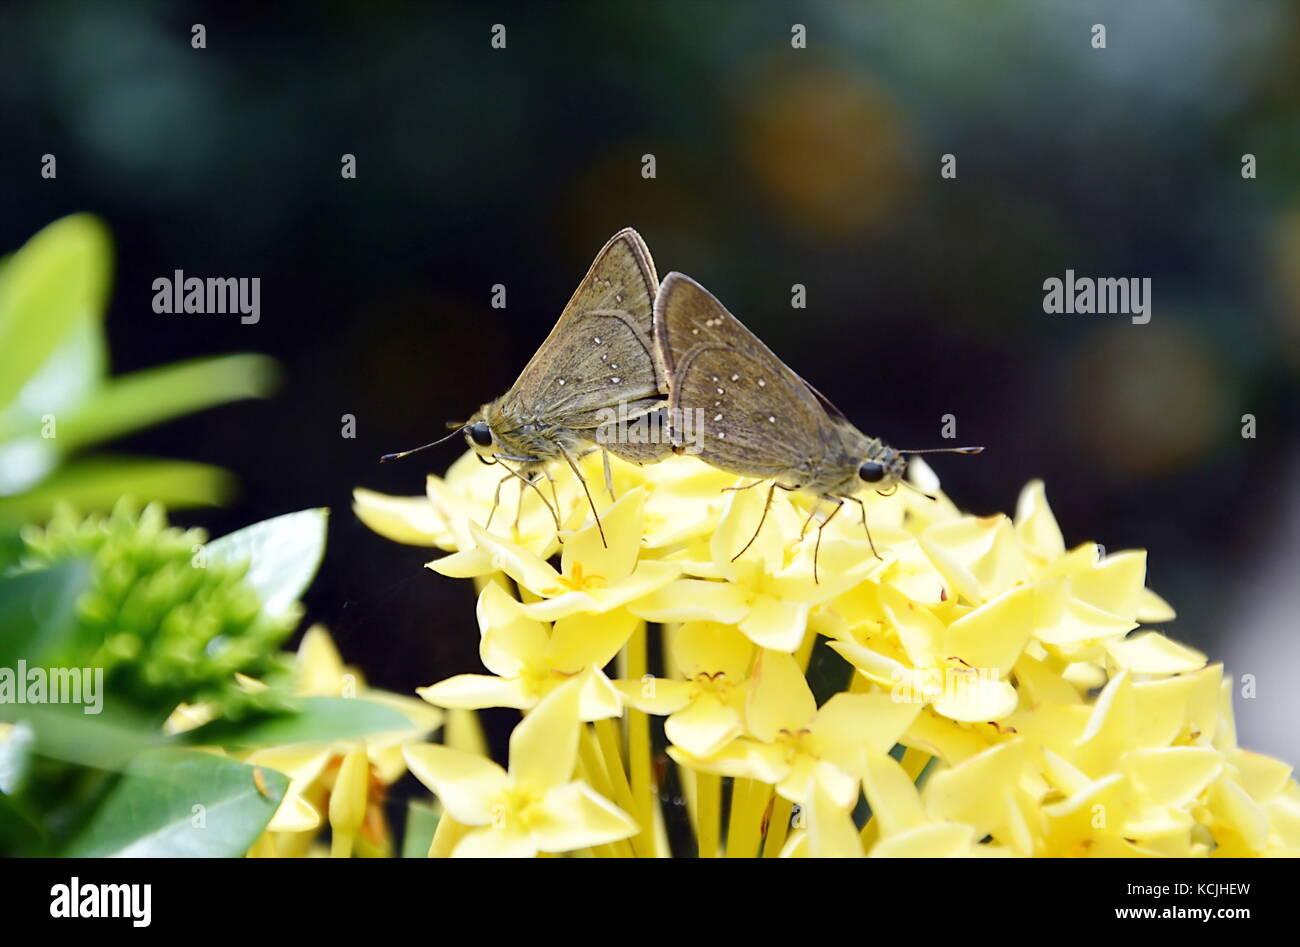 butterfly breeding on yellow  Ixora flower - Stock Image